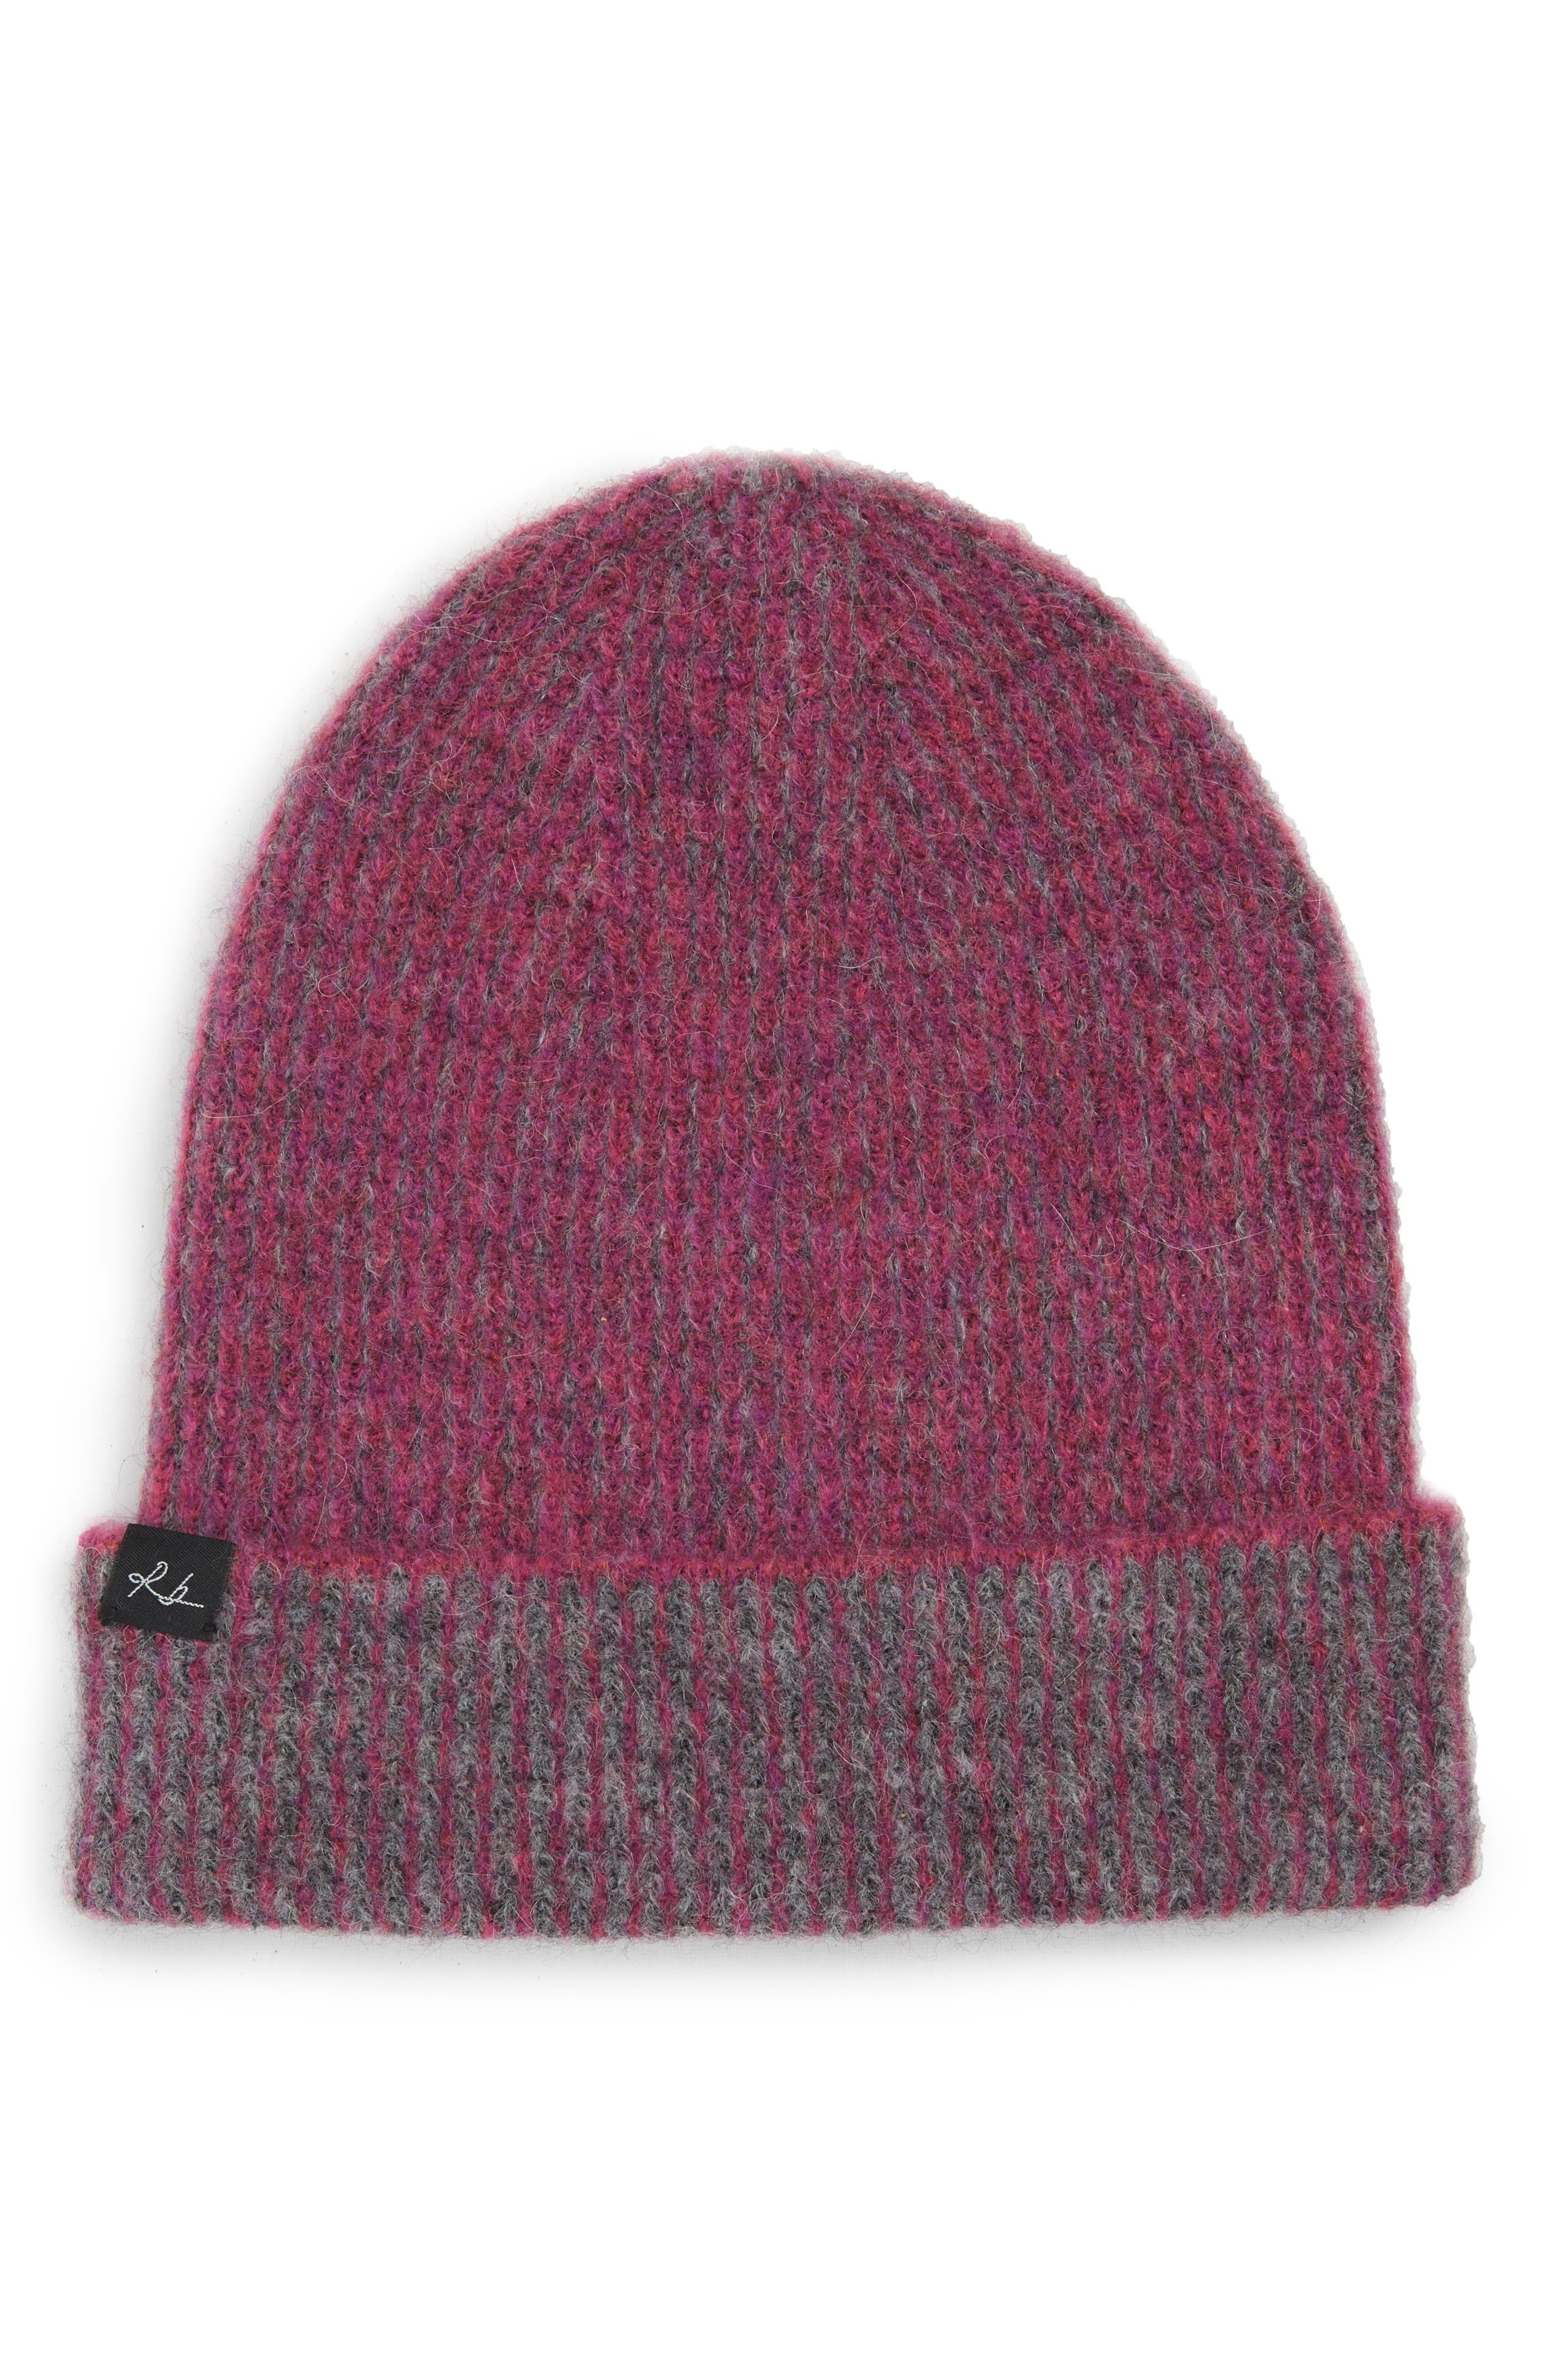 Jonie Two-Tone Alpaca-Blend Beanie Hat in Magenta